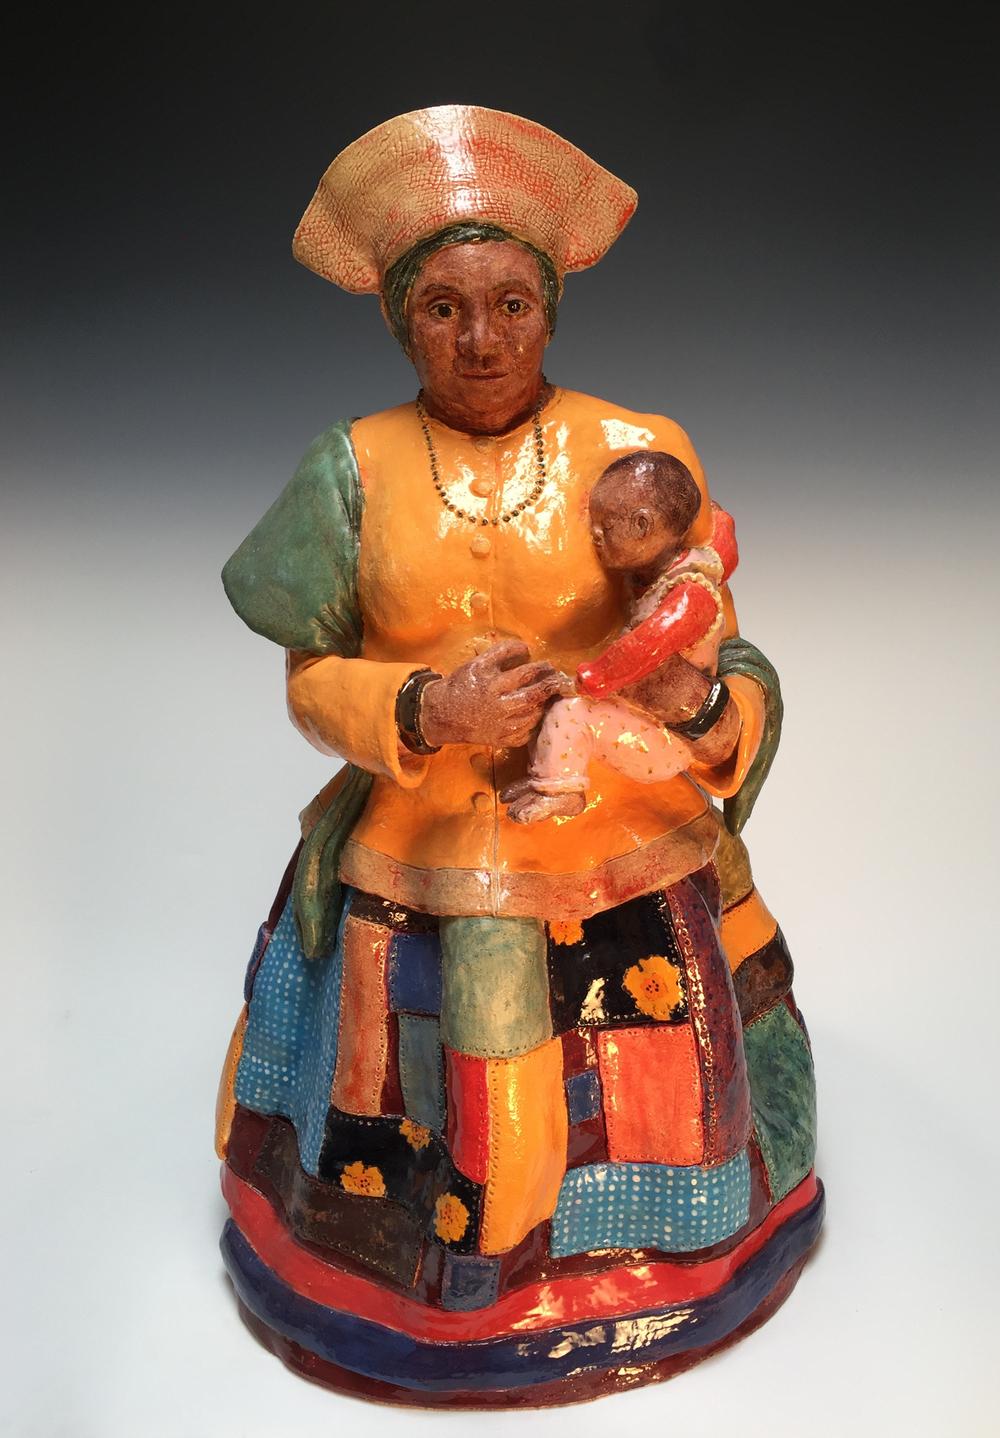 Herero woman with child